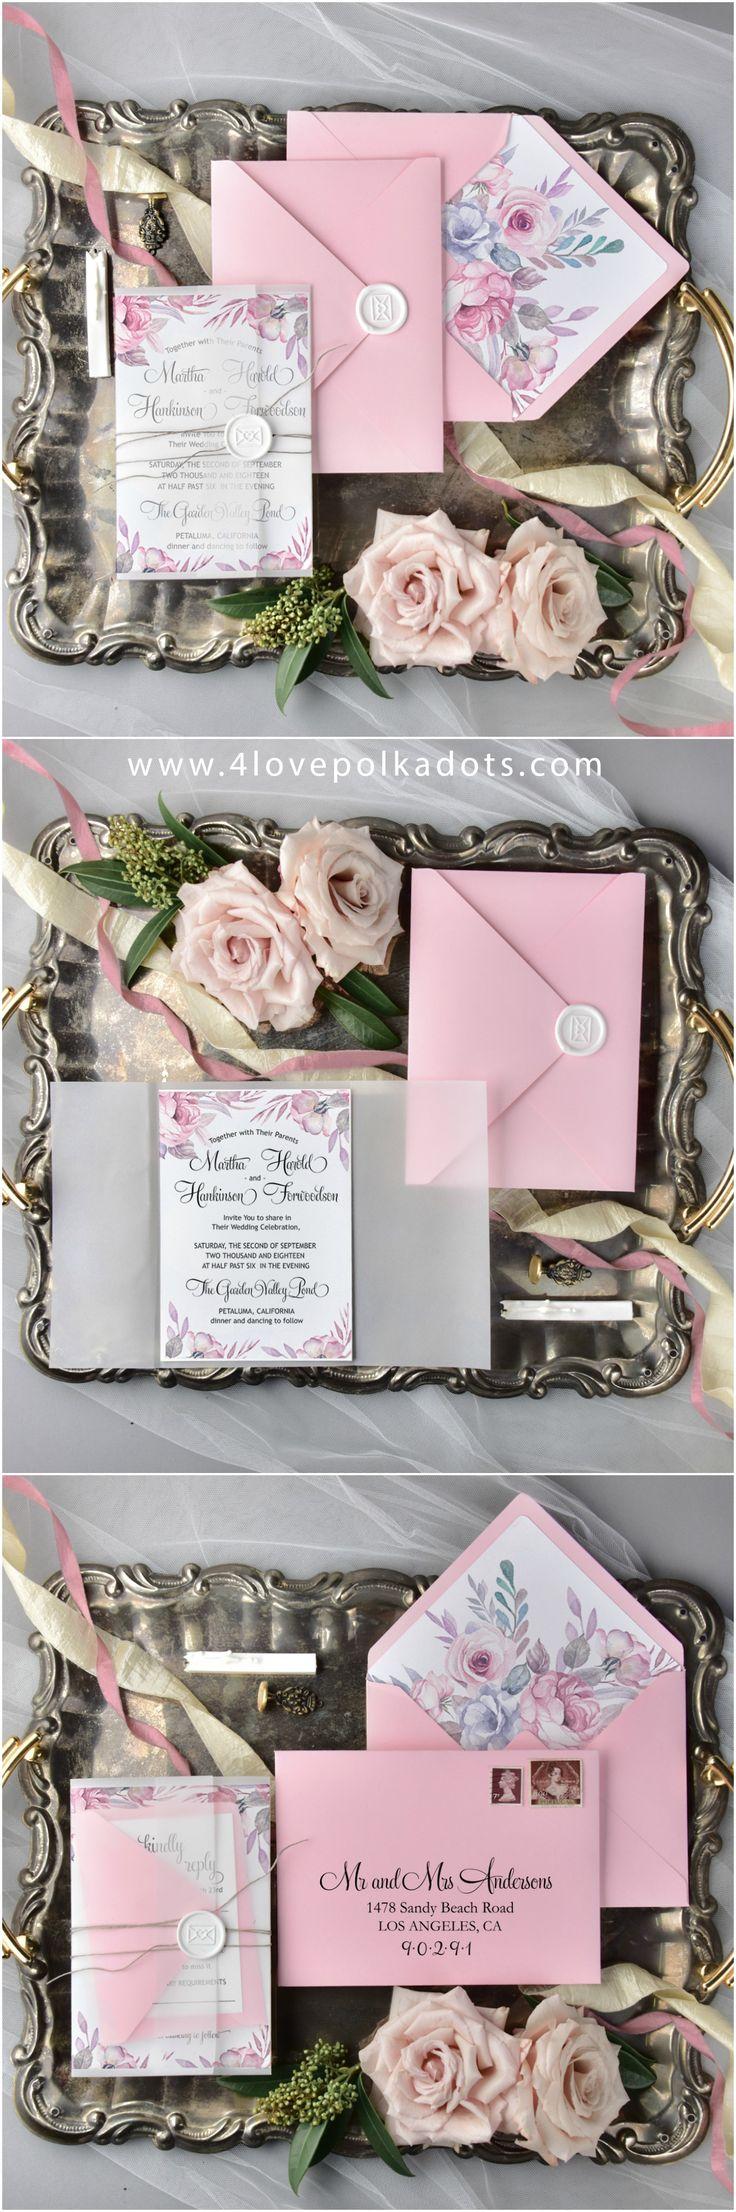 Pink wedding invitations #4lovepolkadots #weddinginvitations #weddingstationery #weddinginvitation #invitationscards #pinkwedding #pinkinvitations #flowerinvitations